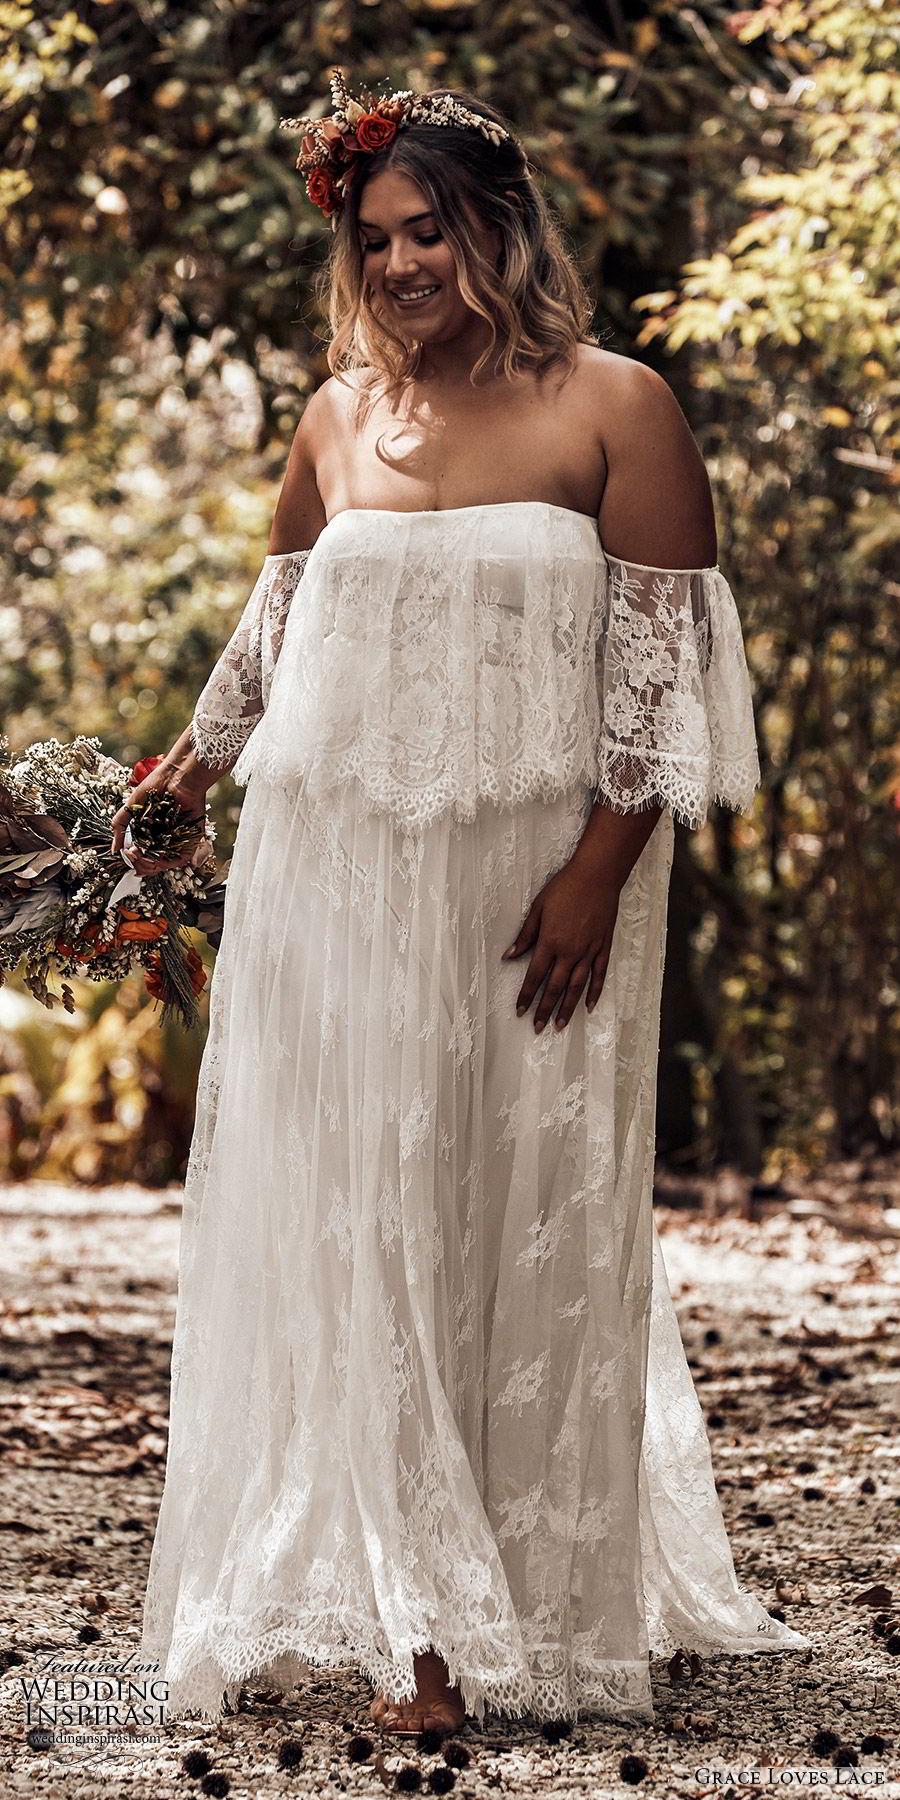 grace loves lace 2019 bridal strapless detached flutter sleeves semi sweetheart soft a line embellished lace wedding dress sweep train plus size boho romantic (4) mv